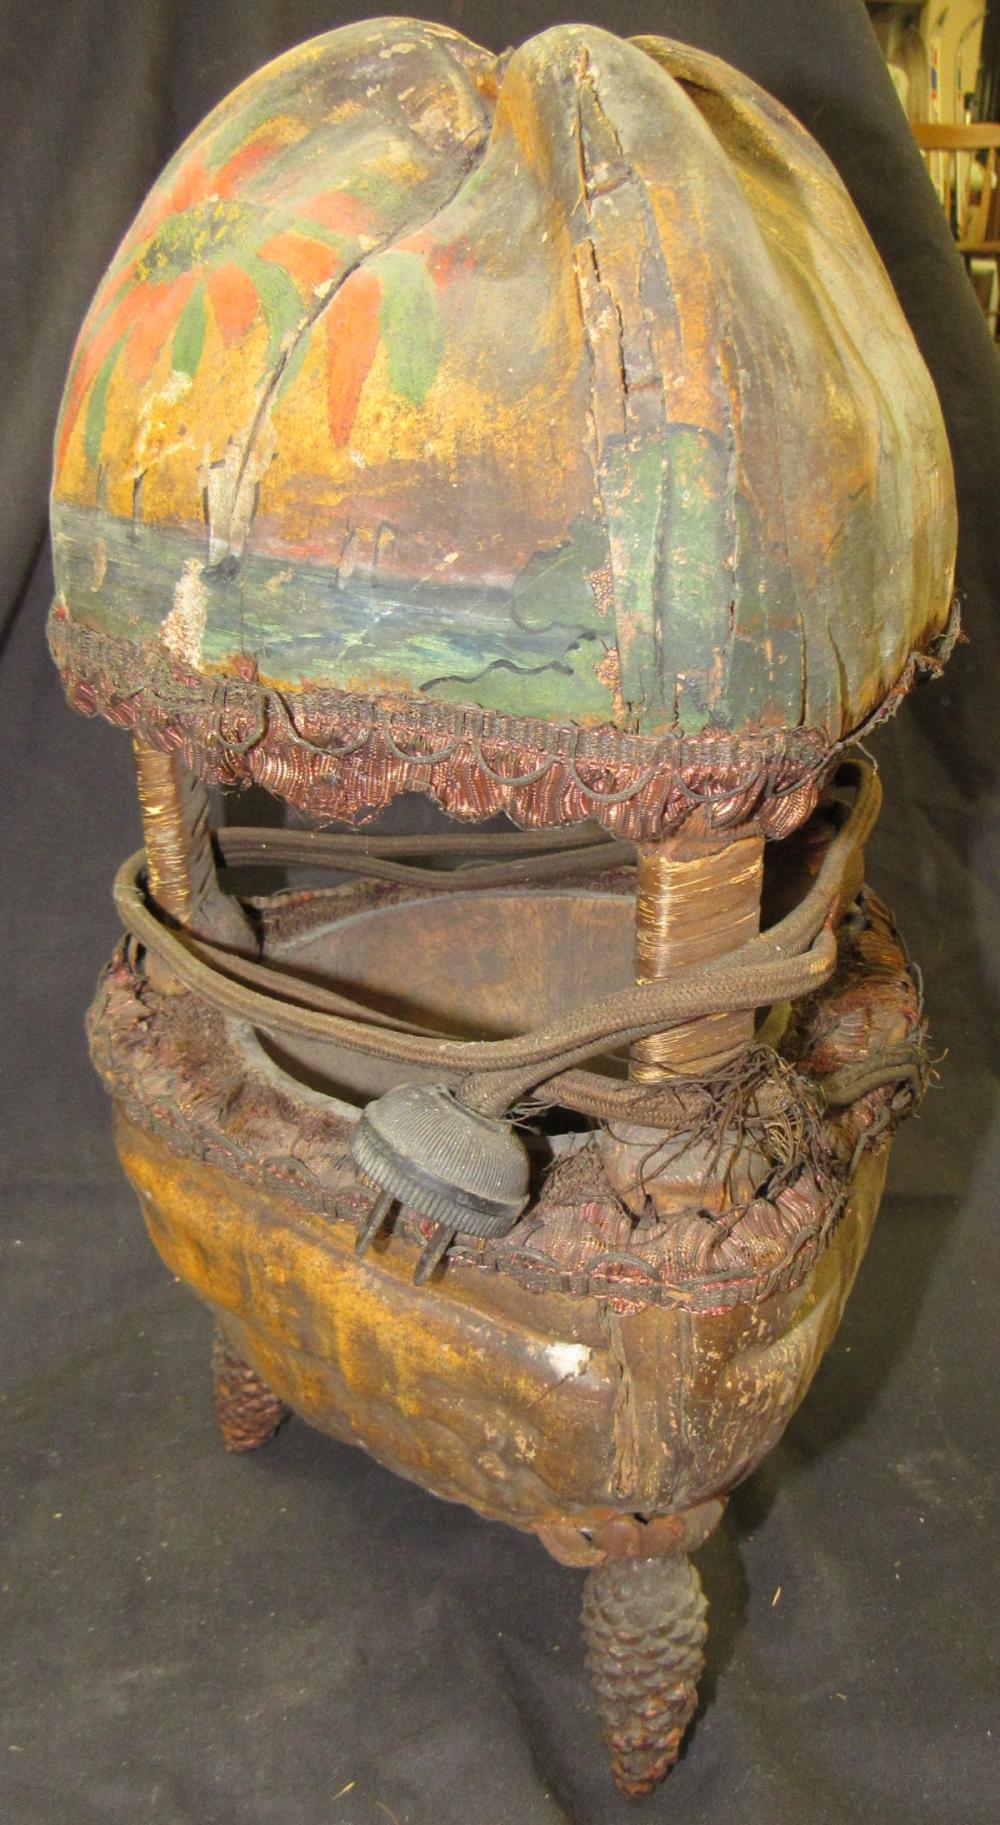 "Vintage Handmade Coconut Shell Lamp, 14""H x 7 1/2"" Dia., EC"